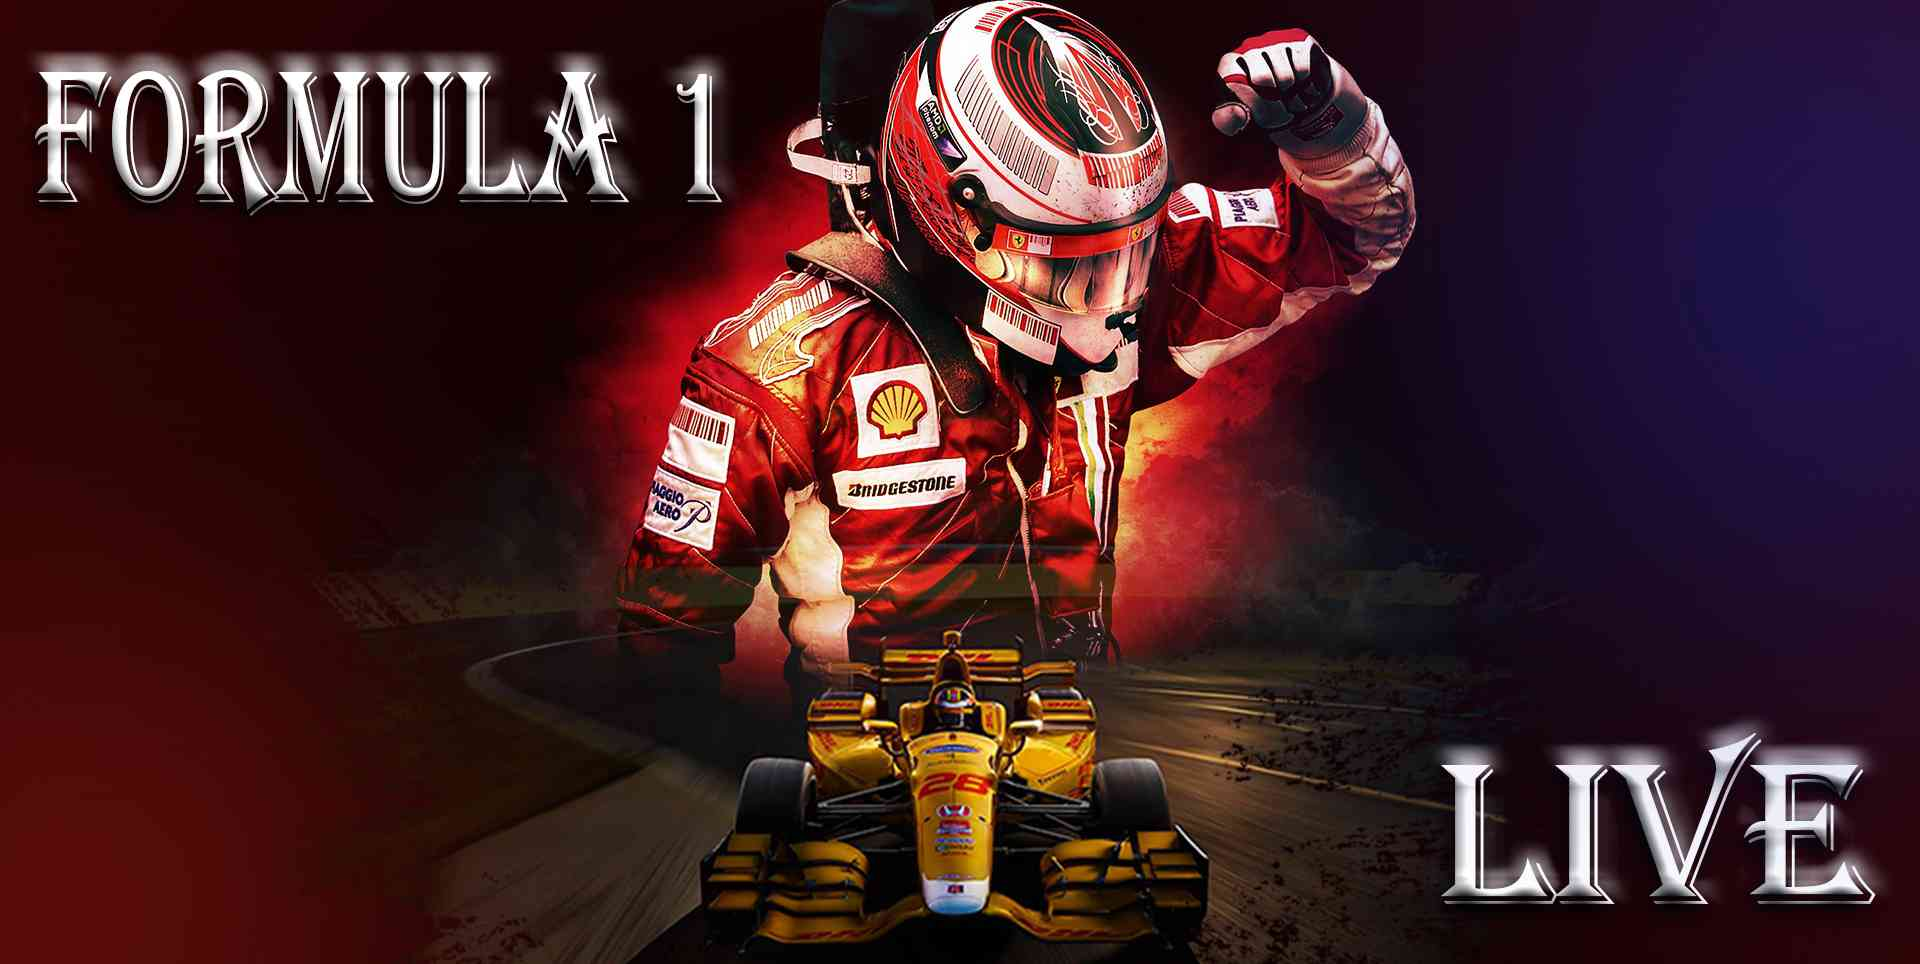 live-2016-american-formula-1-grand-prix-online